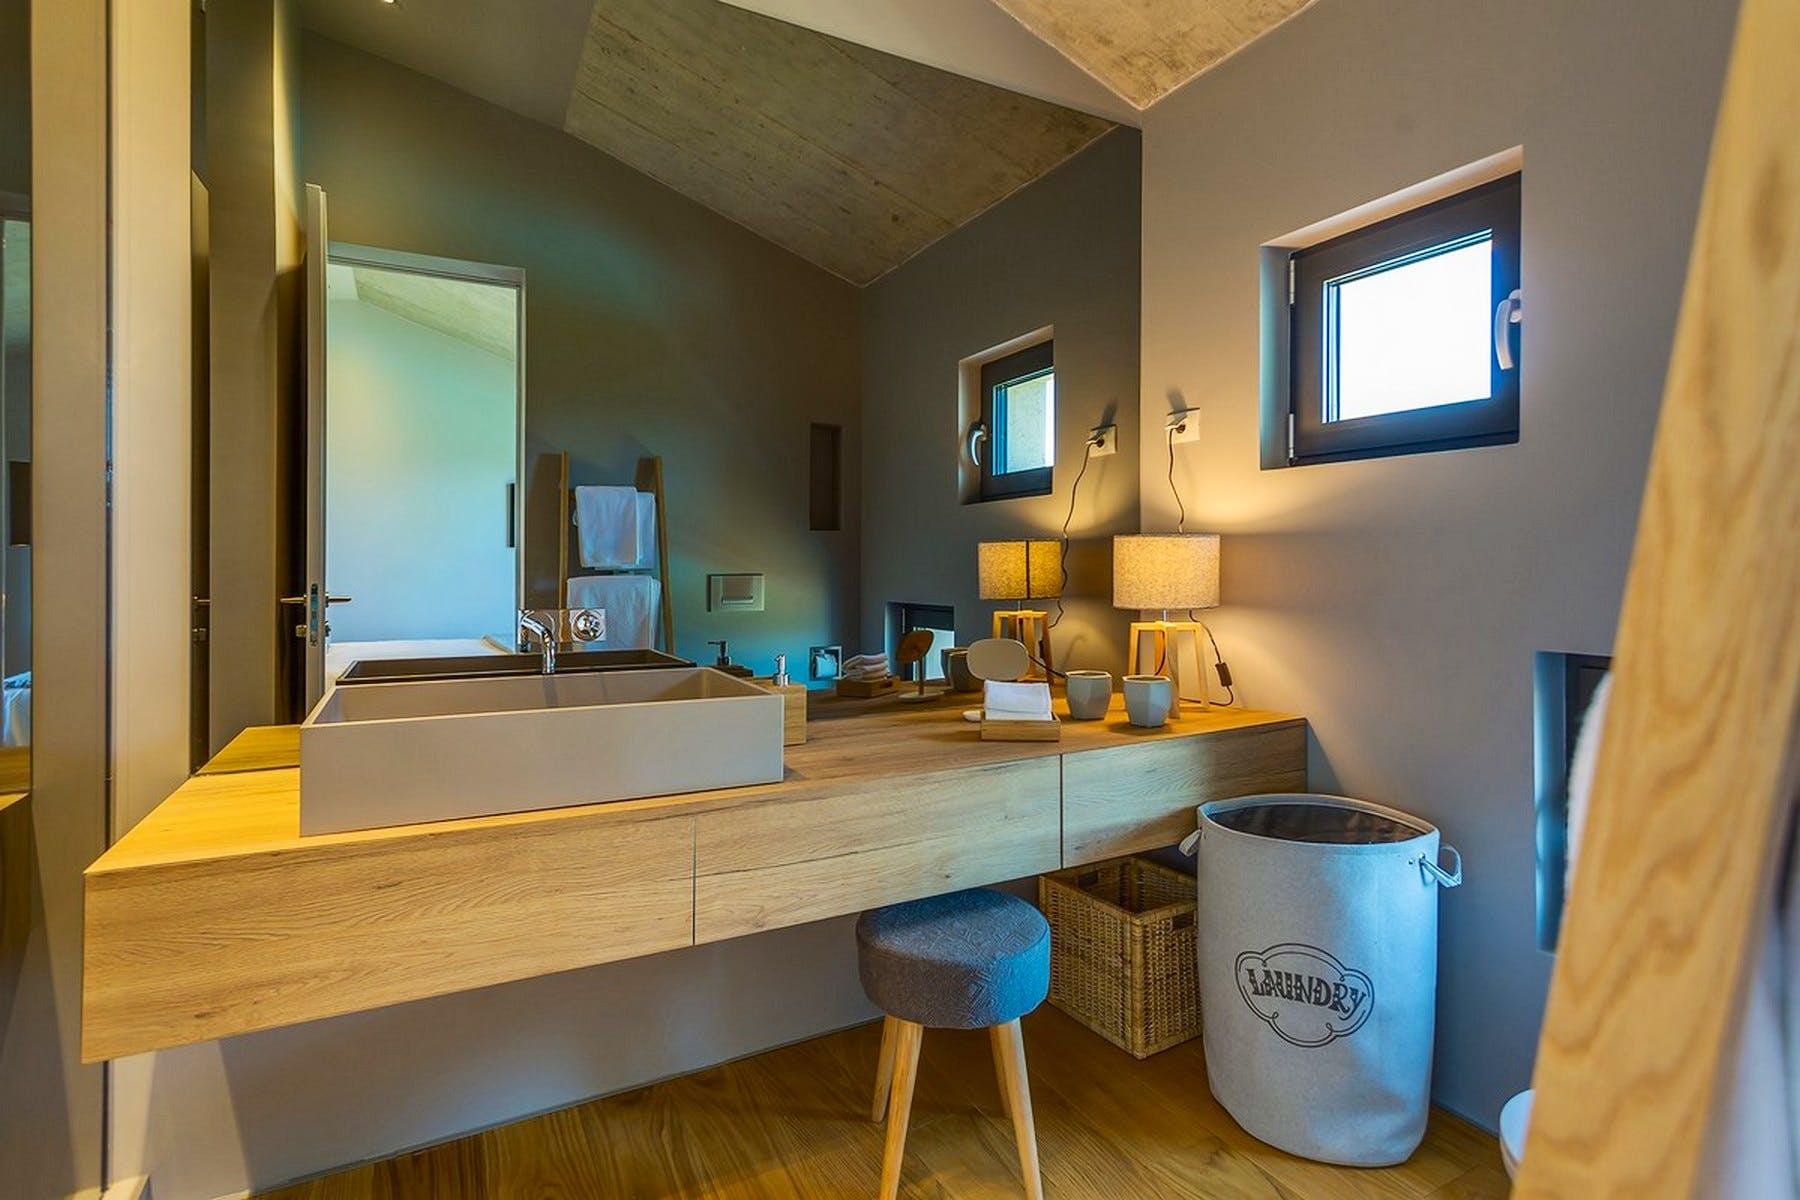 Modern furnishment of the bathroom